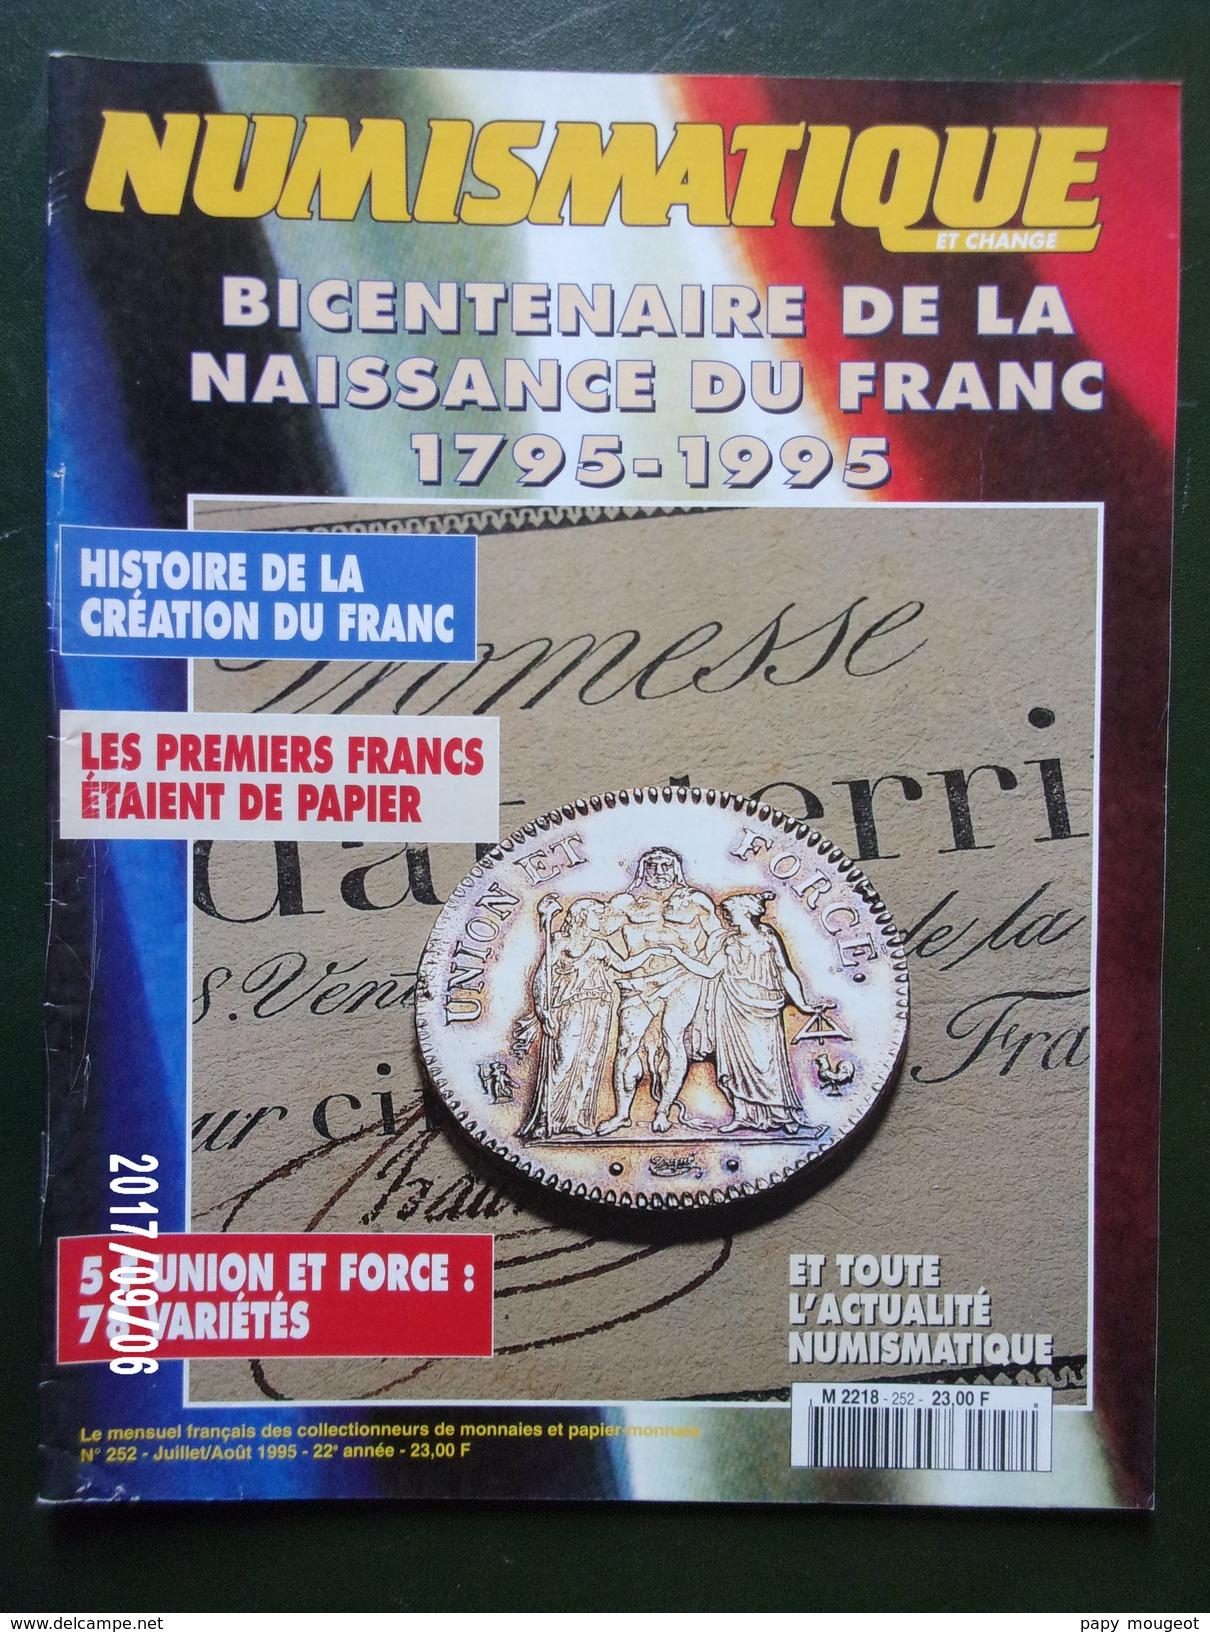 Numismatique - French